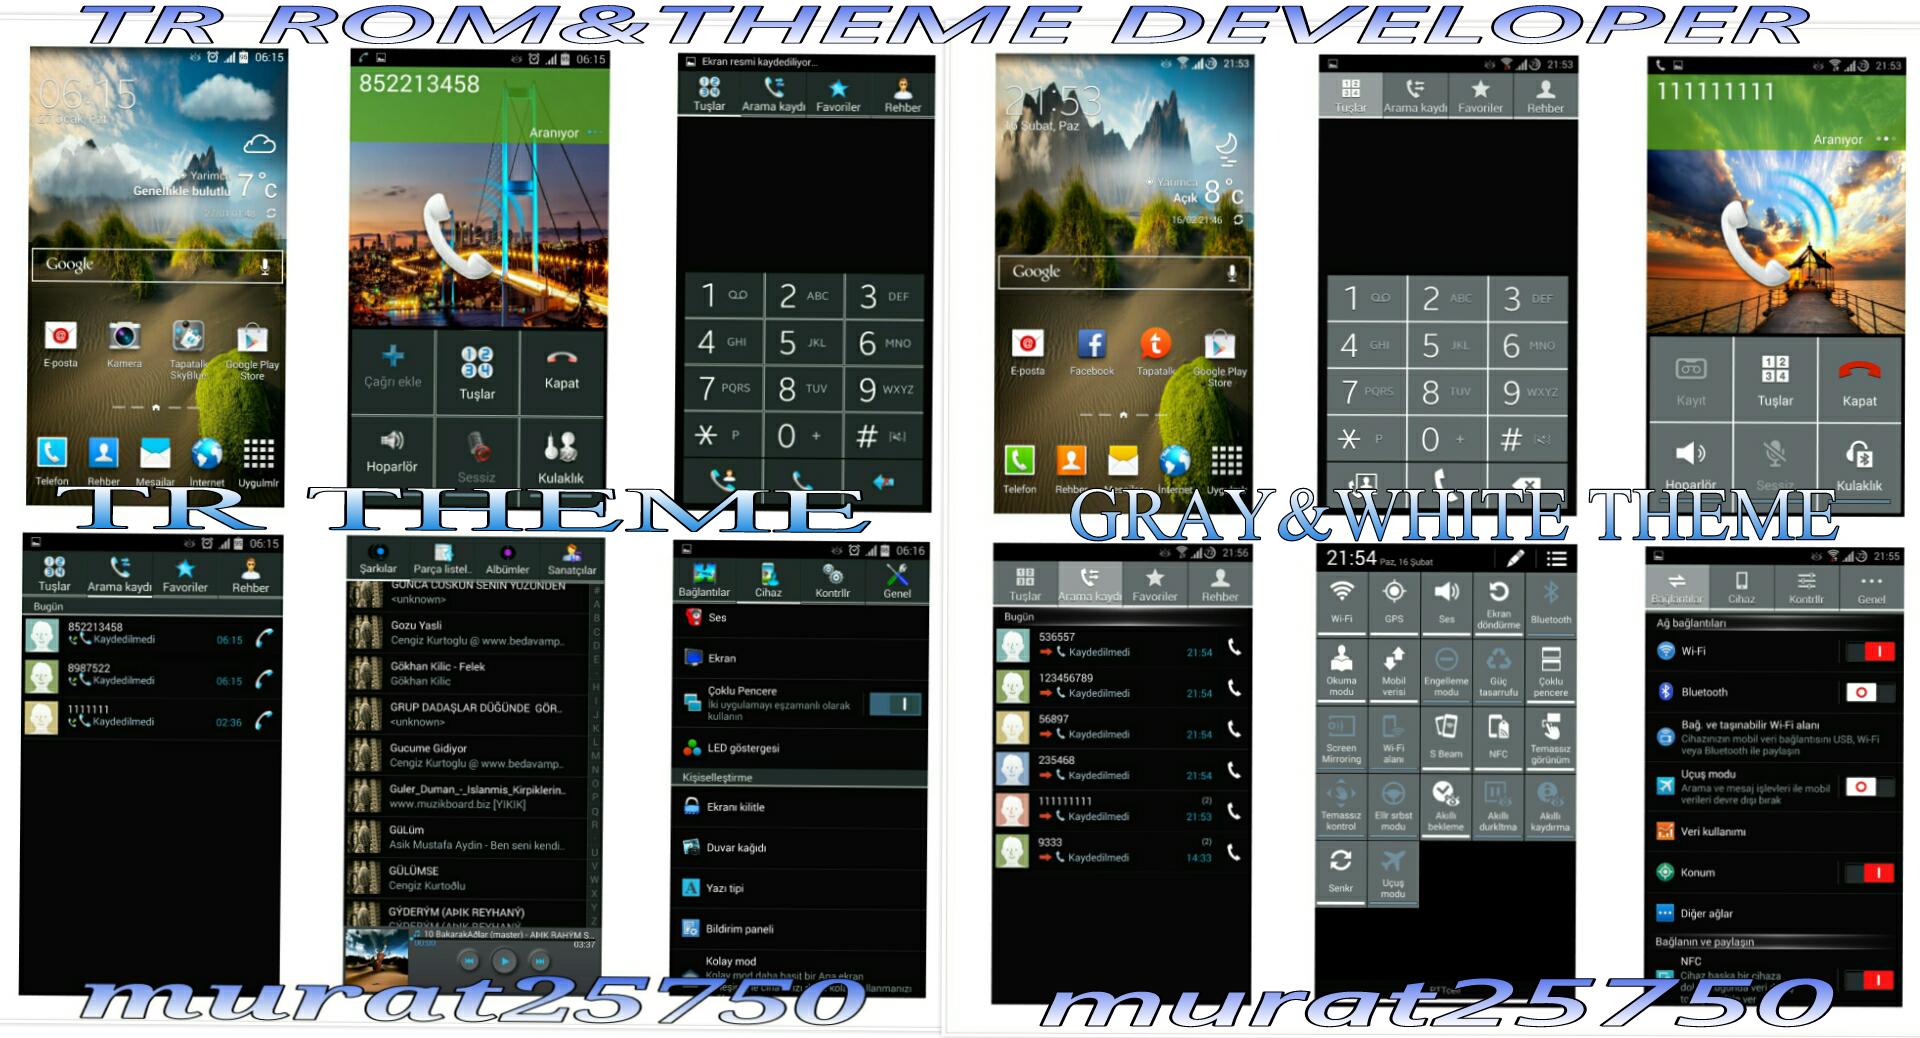 [SGN3][ROM 4.4.2][SM-N900] [UBUENH1][15.09.2014] TR-ROM-T22 [AROMA] Samsung Galaxy Note3 EQ8oGr